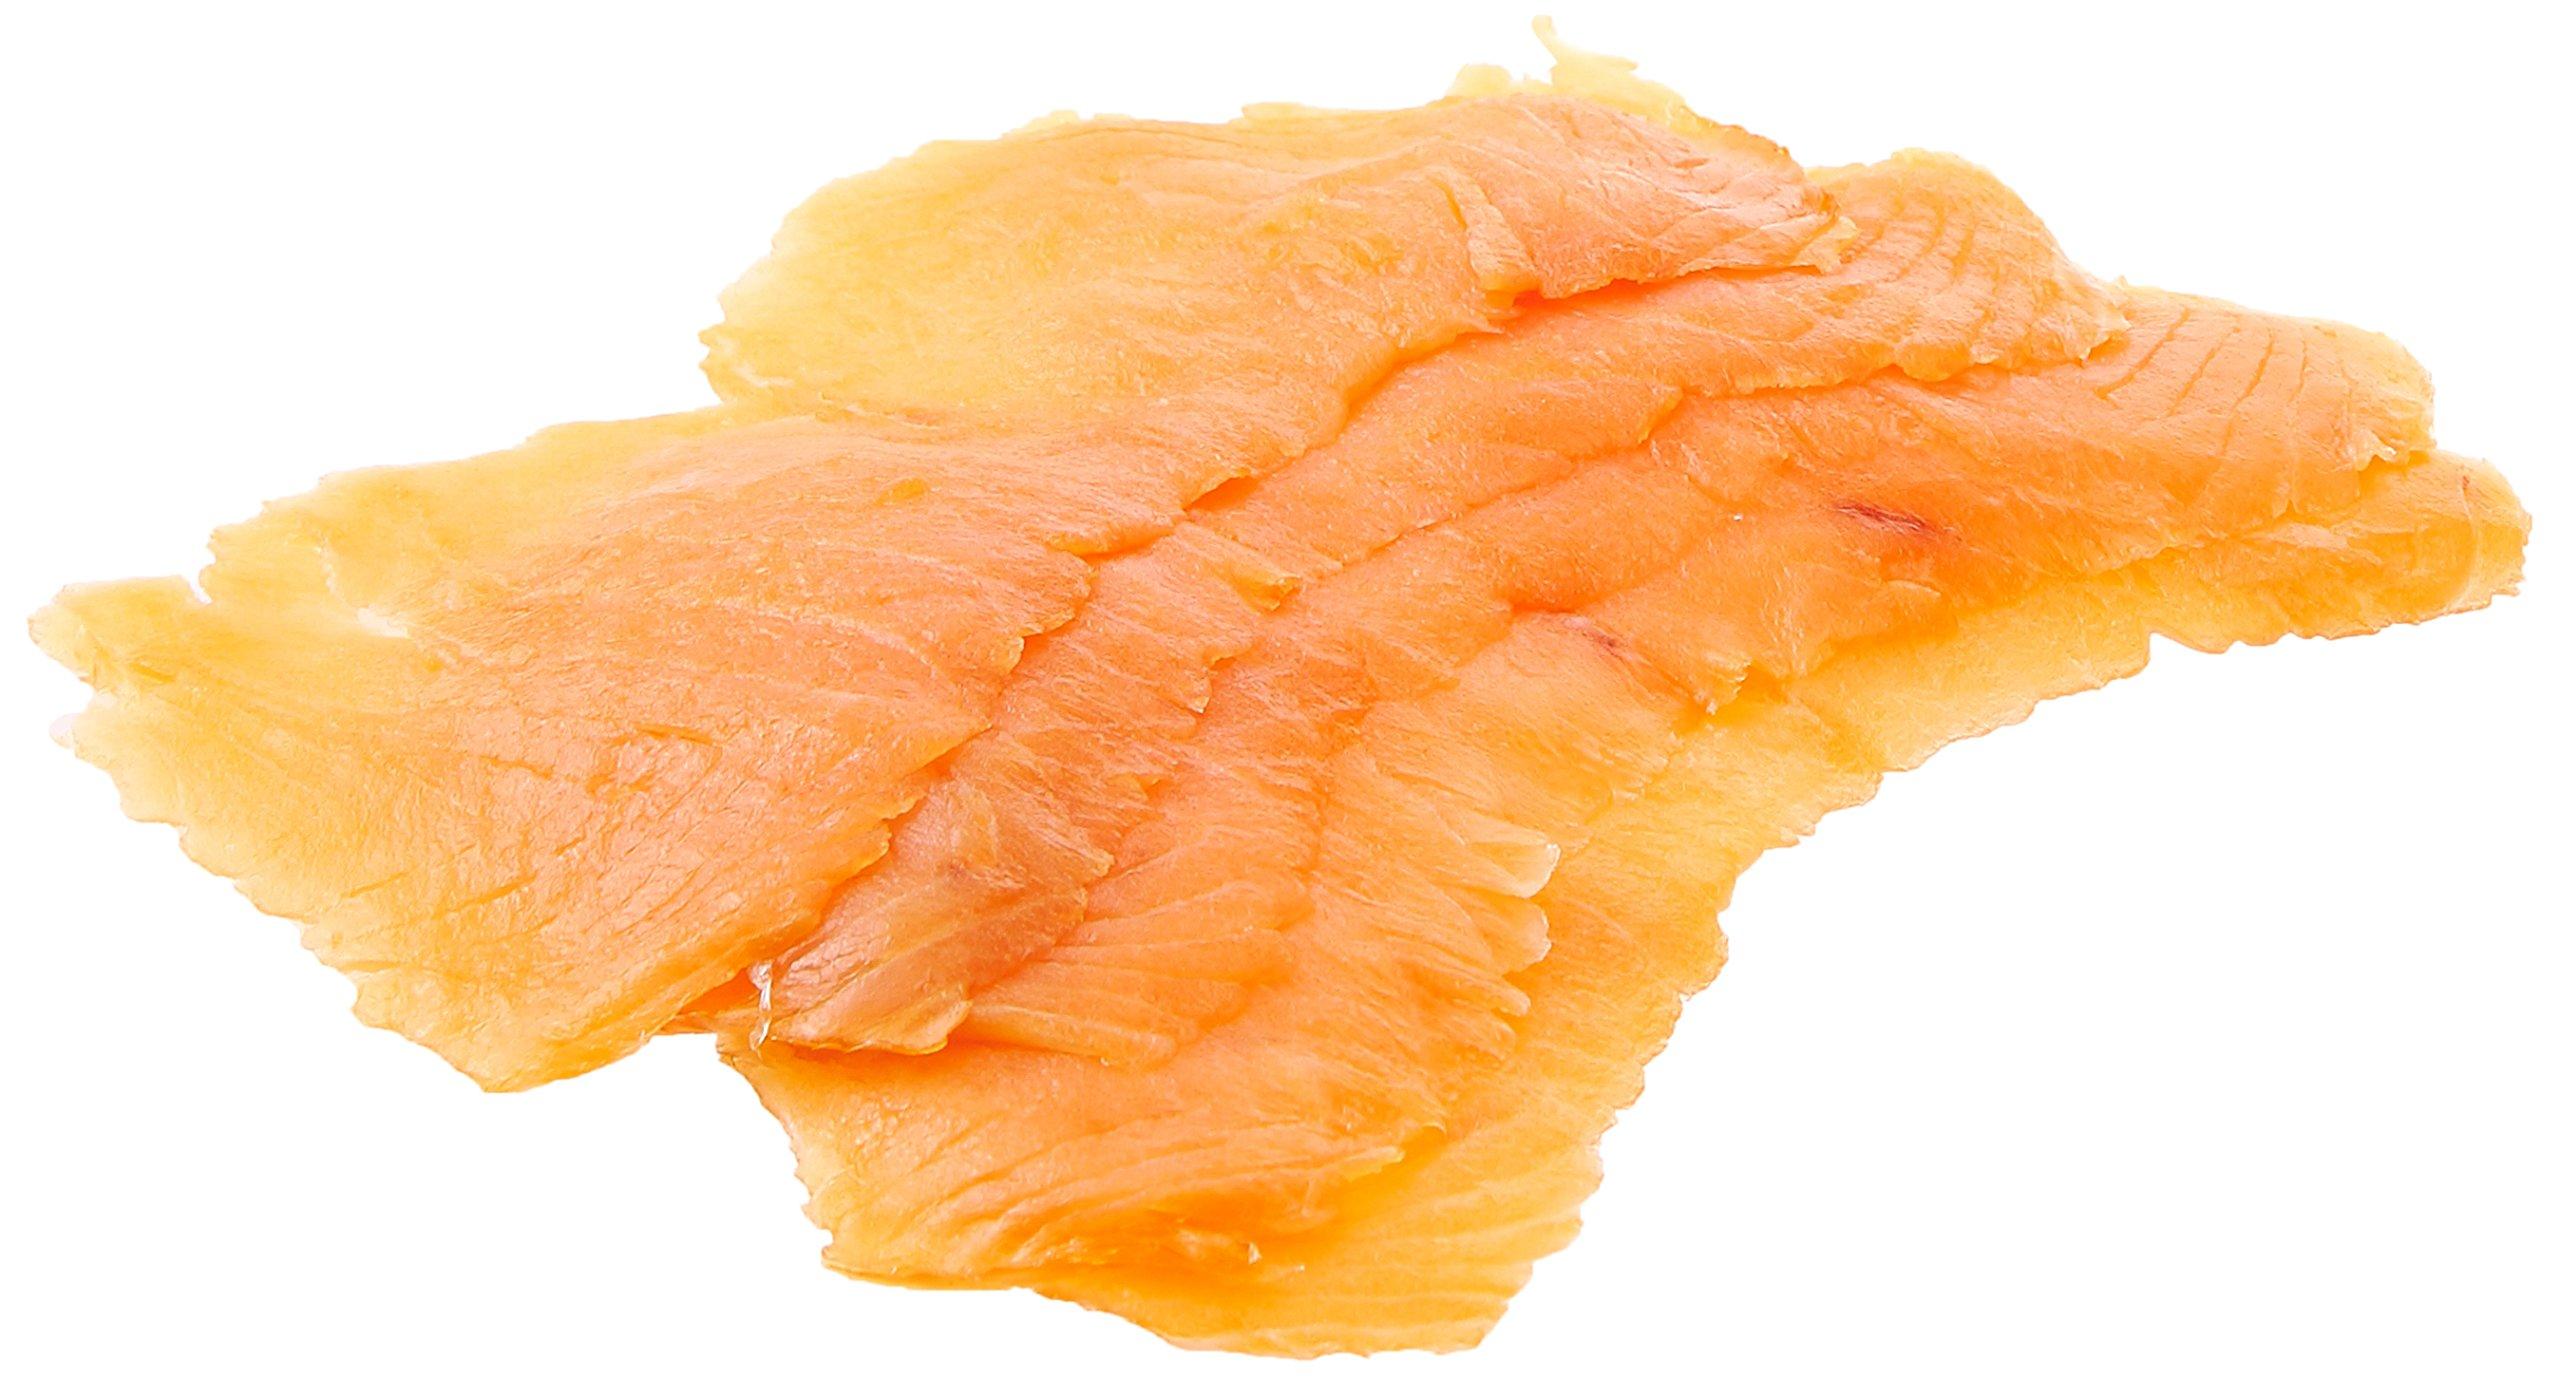 Buy Echo Falls, Smoked Scottish Salmon, 4 oz in Cheap Price